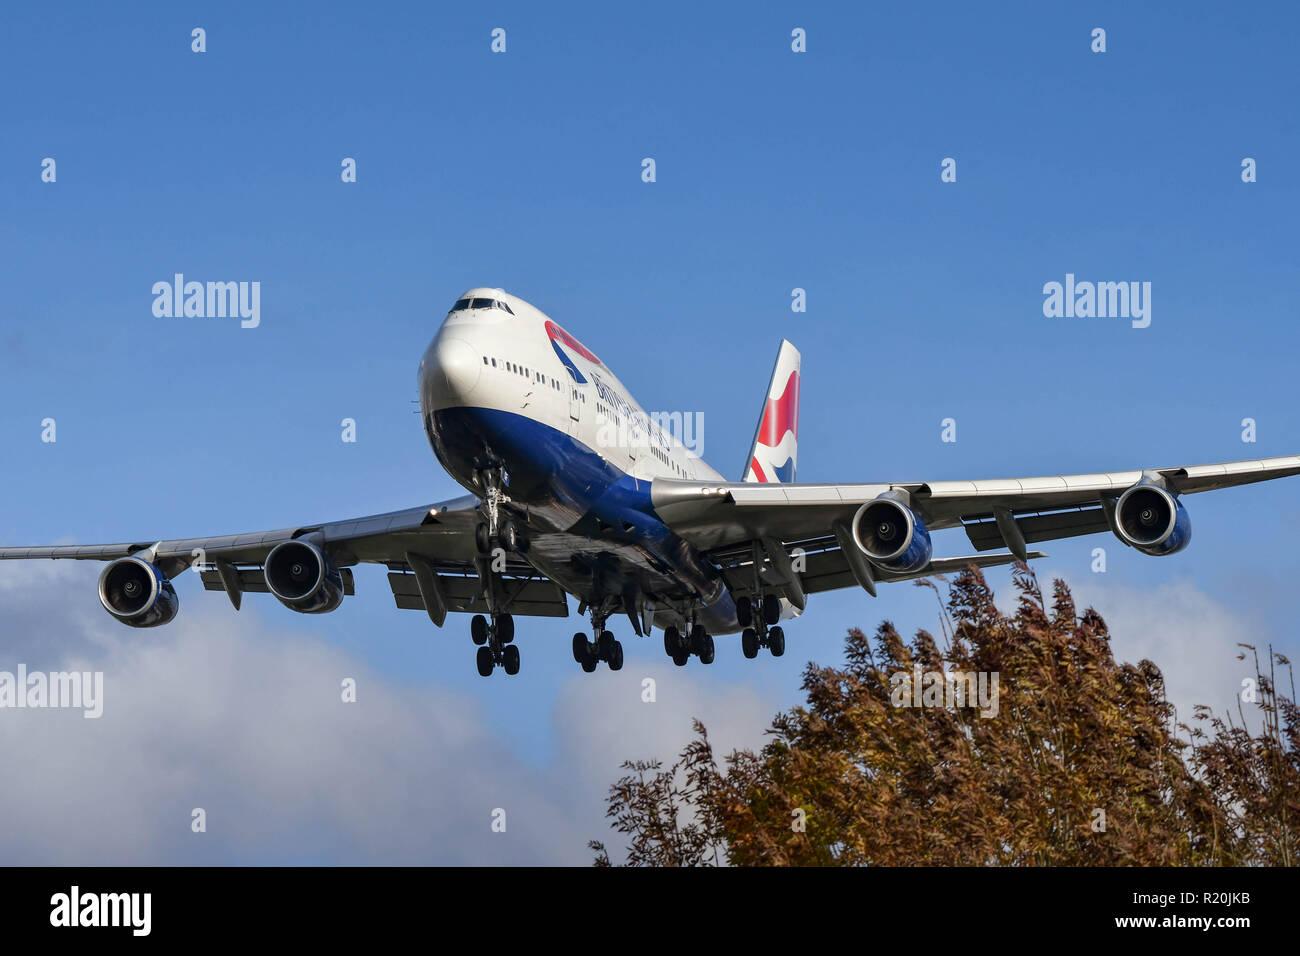 "LONDON, ENGLAND - NOVEMBER 2018: British Airways Boeing 747 ""Jumbo jet"" long haul airliner landing at London Heathrow Airport. Stock Photo"